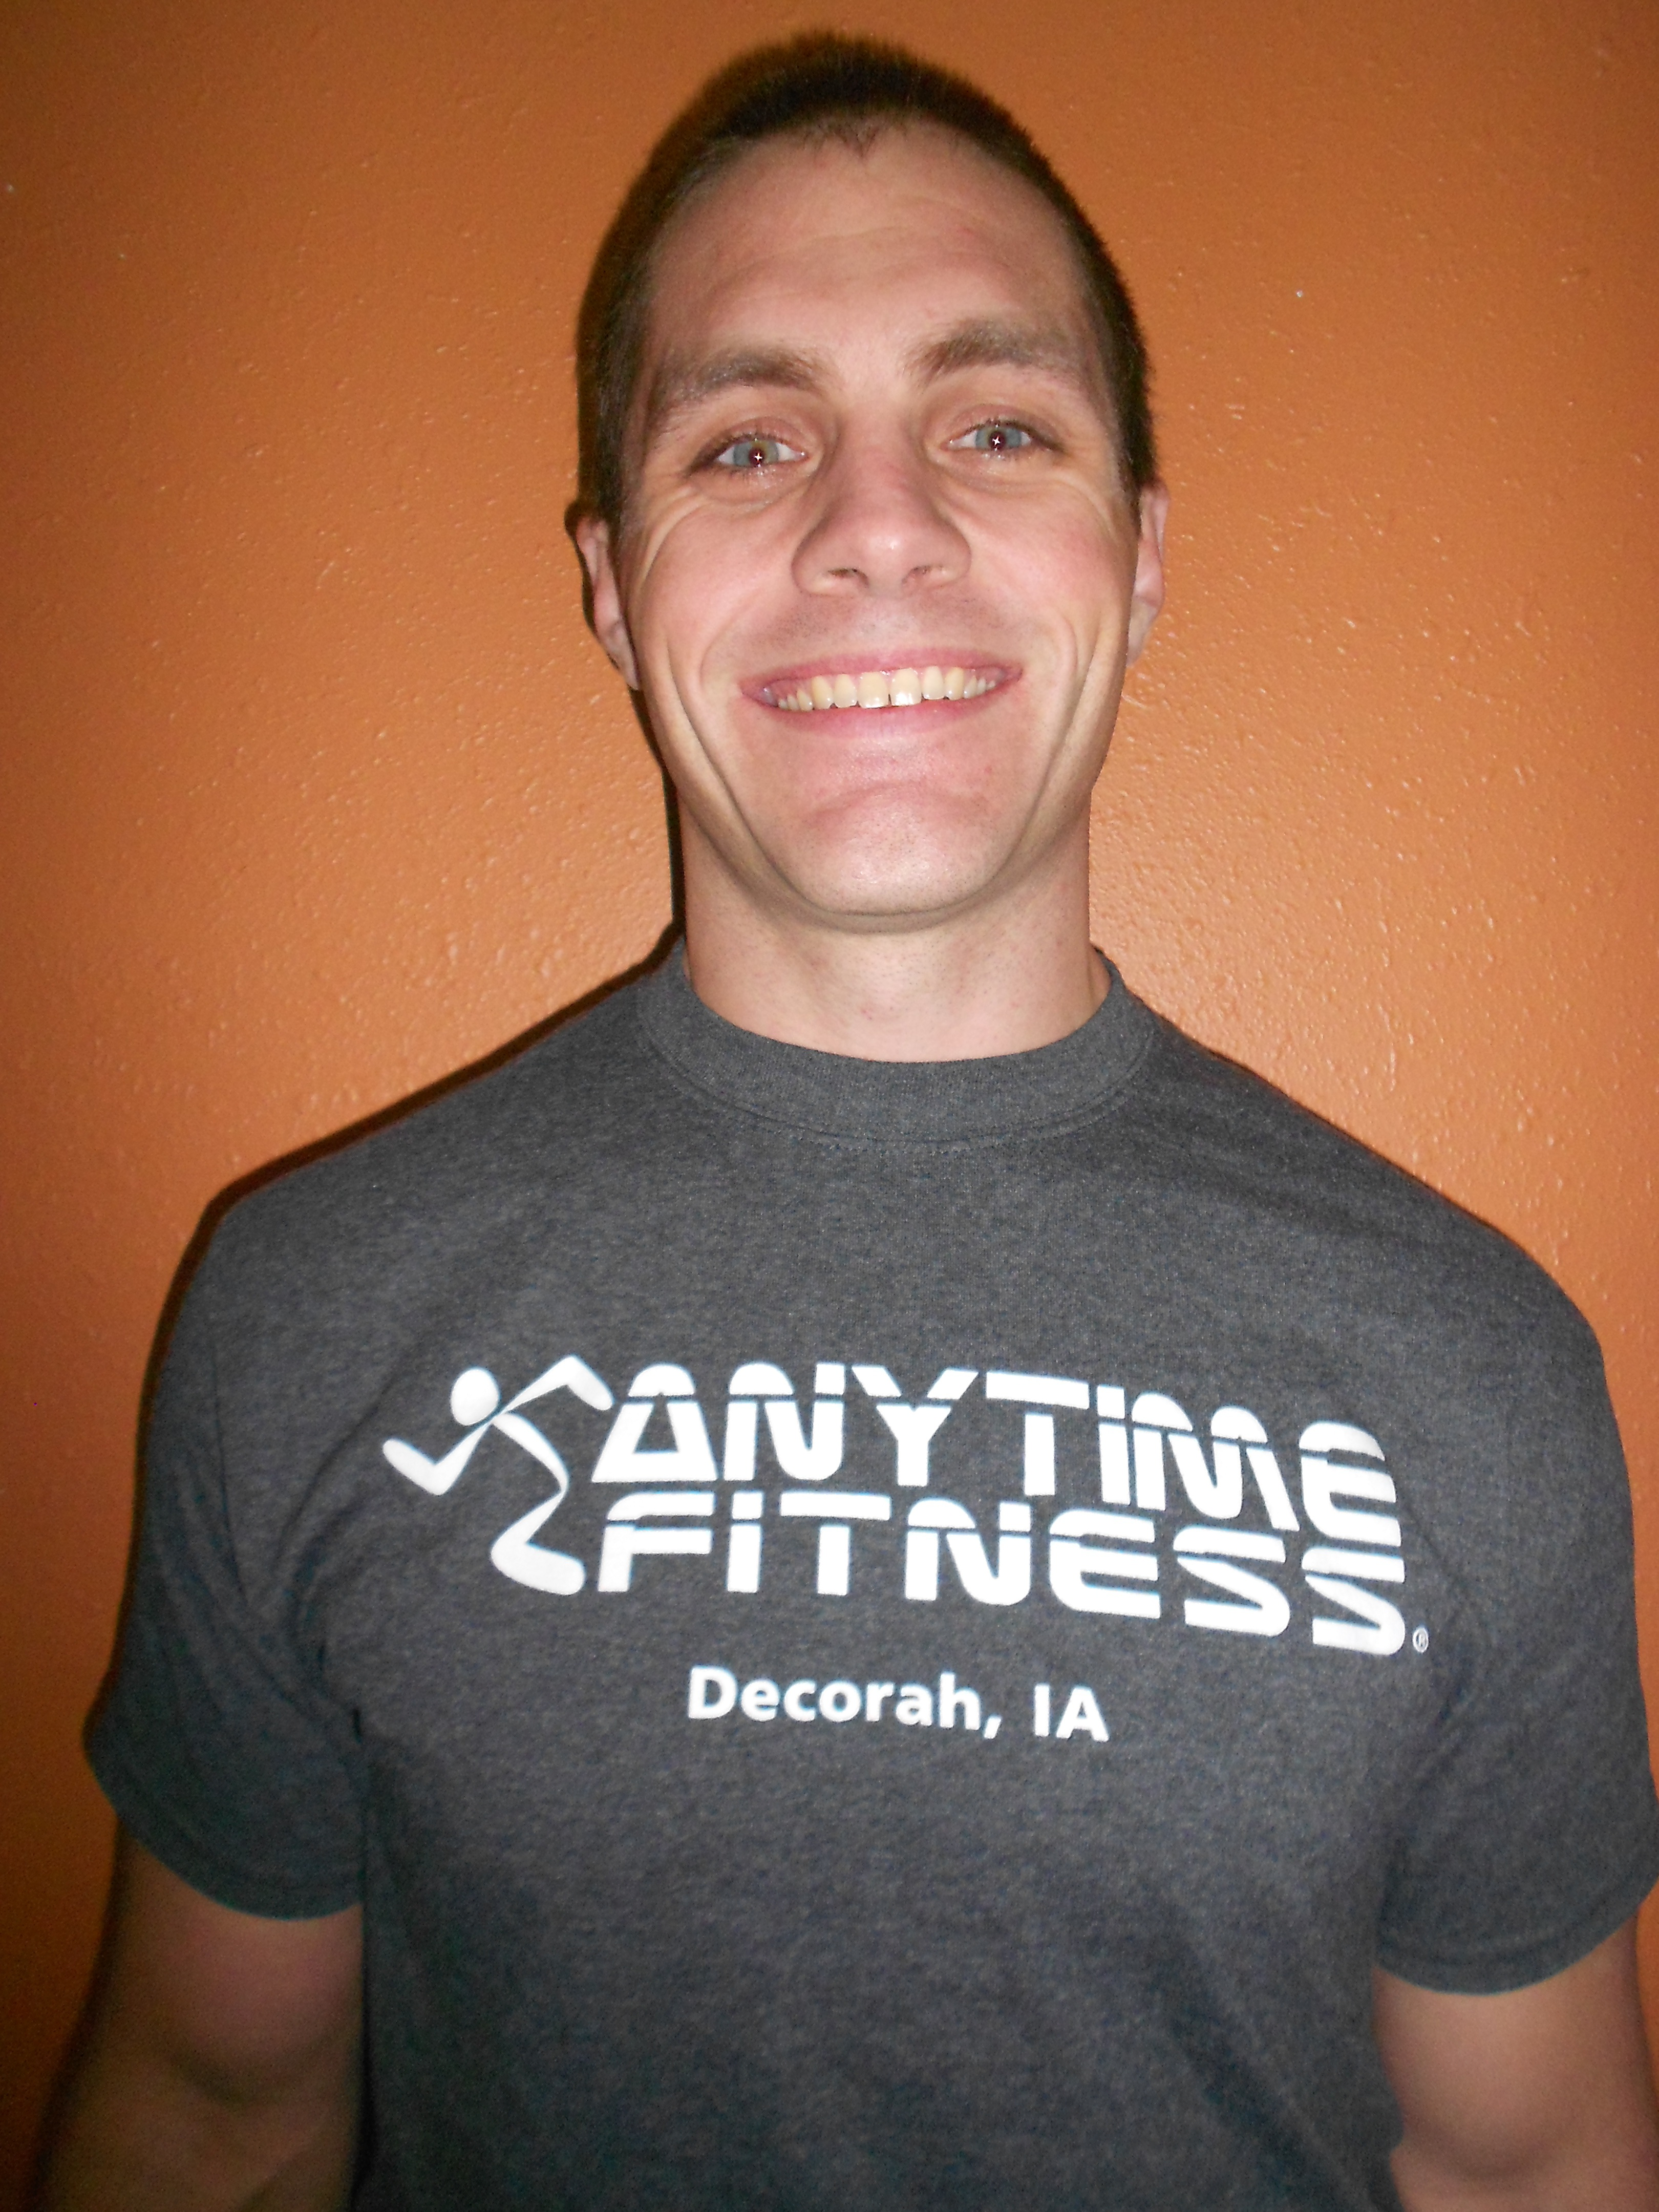 Scott Searcy